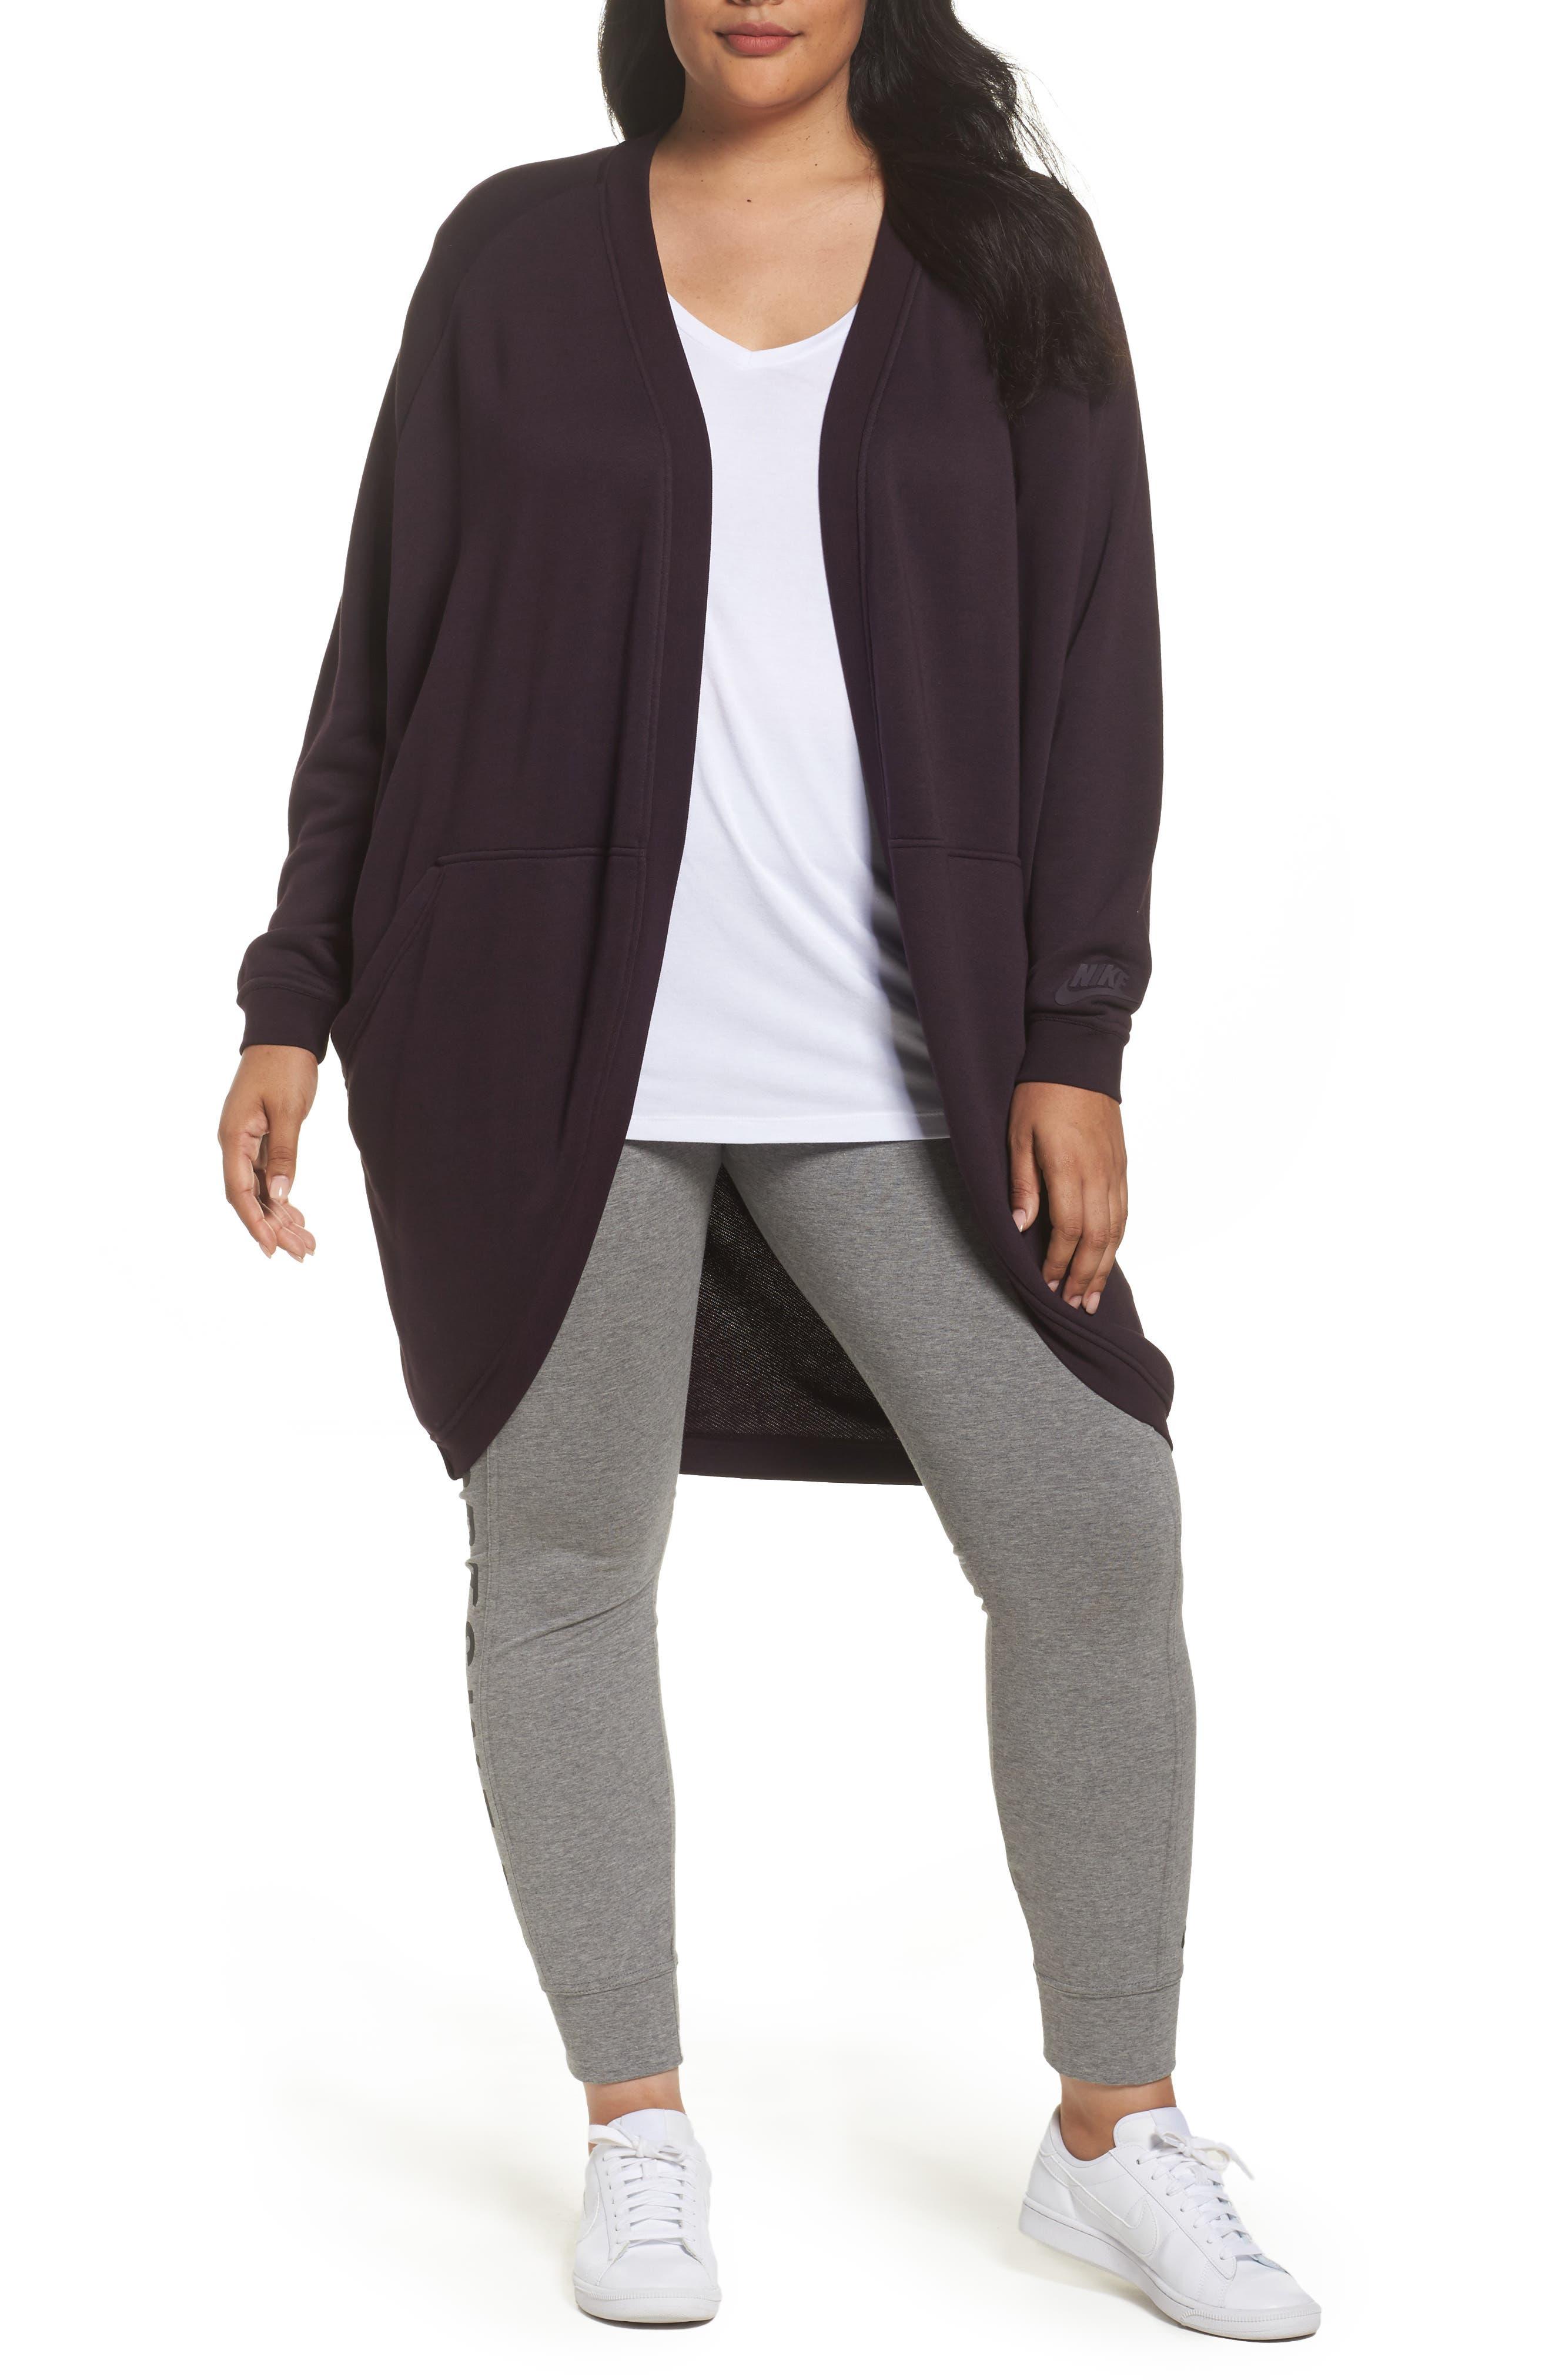 Sportswear Modern Cardigan,                         Main,                         color, Port Wine/ Port Wine